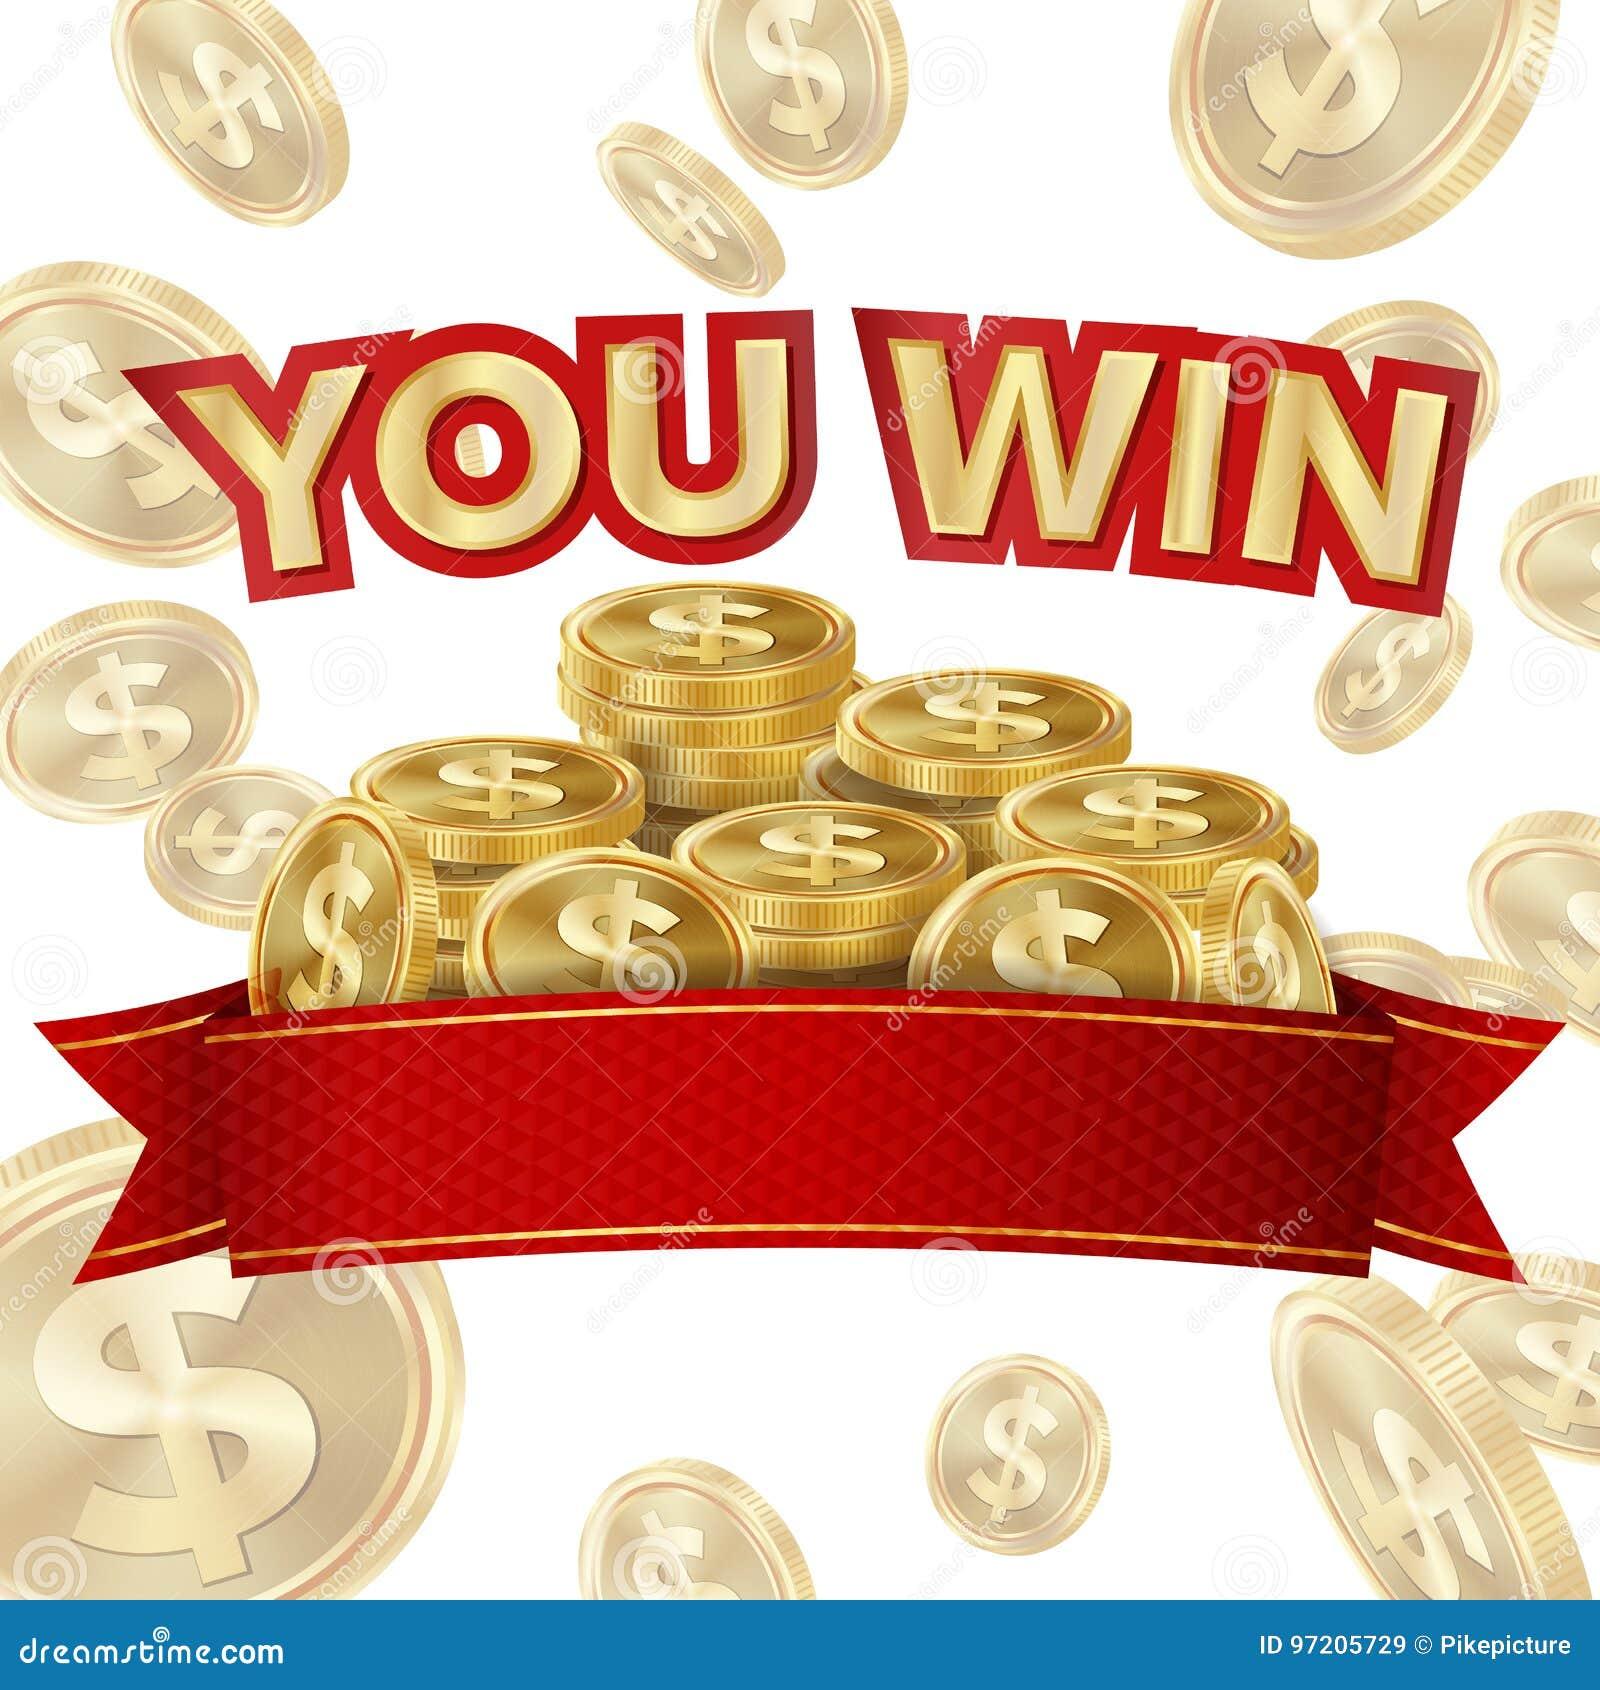 PokerStars Stars Rewards: PokerStars Shafting Their Players Yet Again